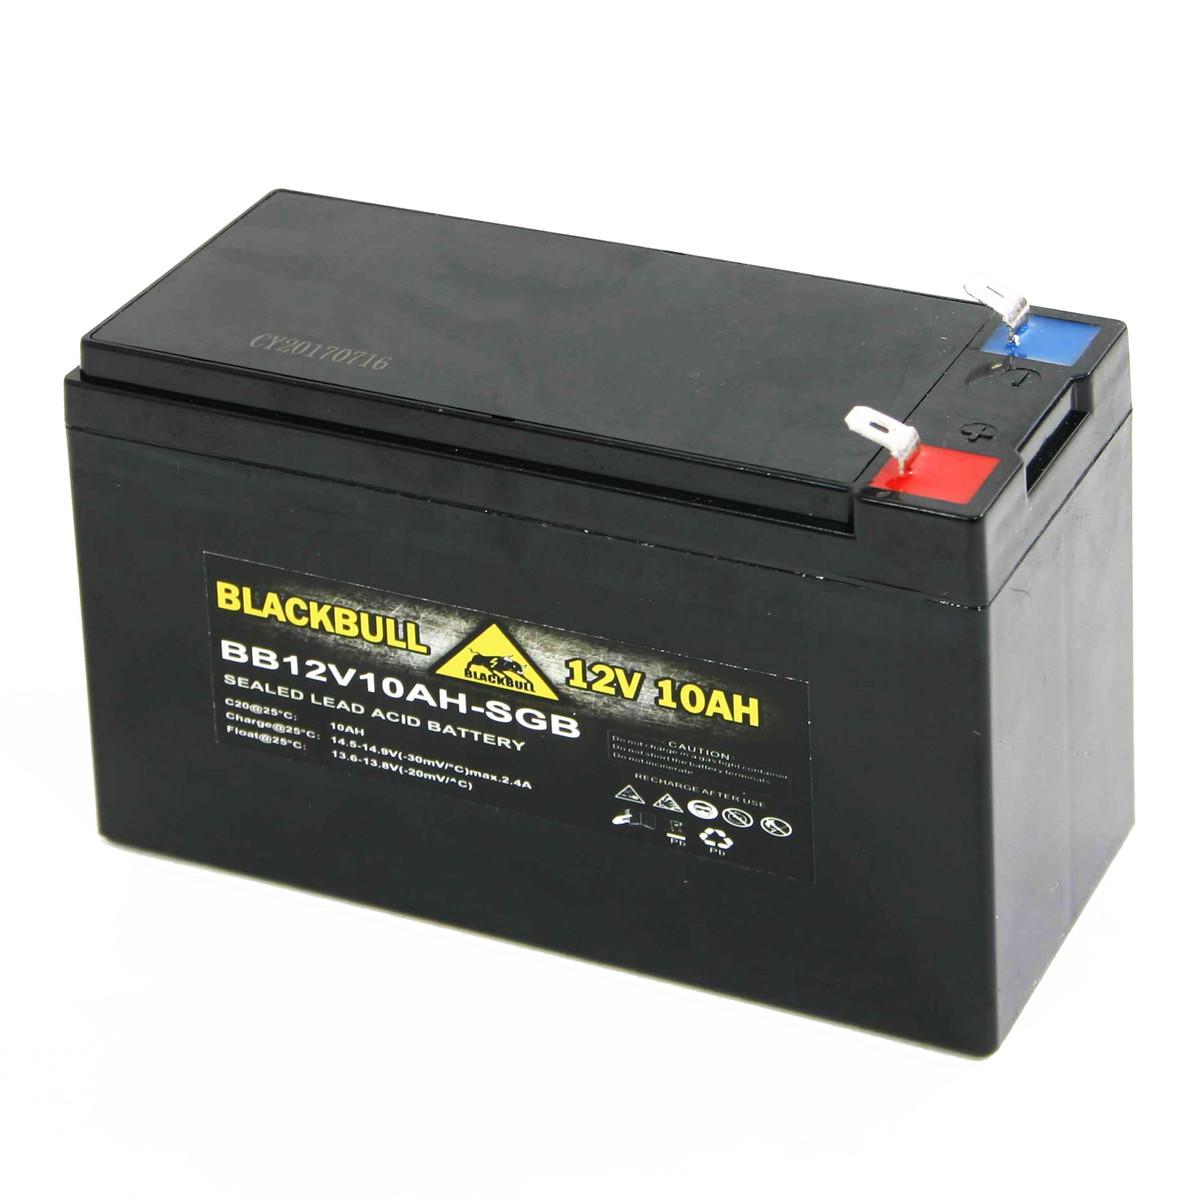 Blackbull pro 12V 10AH Akku Zyklenfest XXL Faston Steckanschluss-SGB